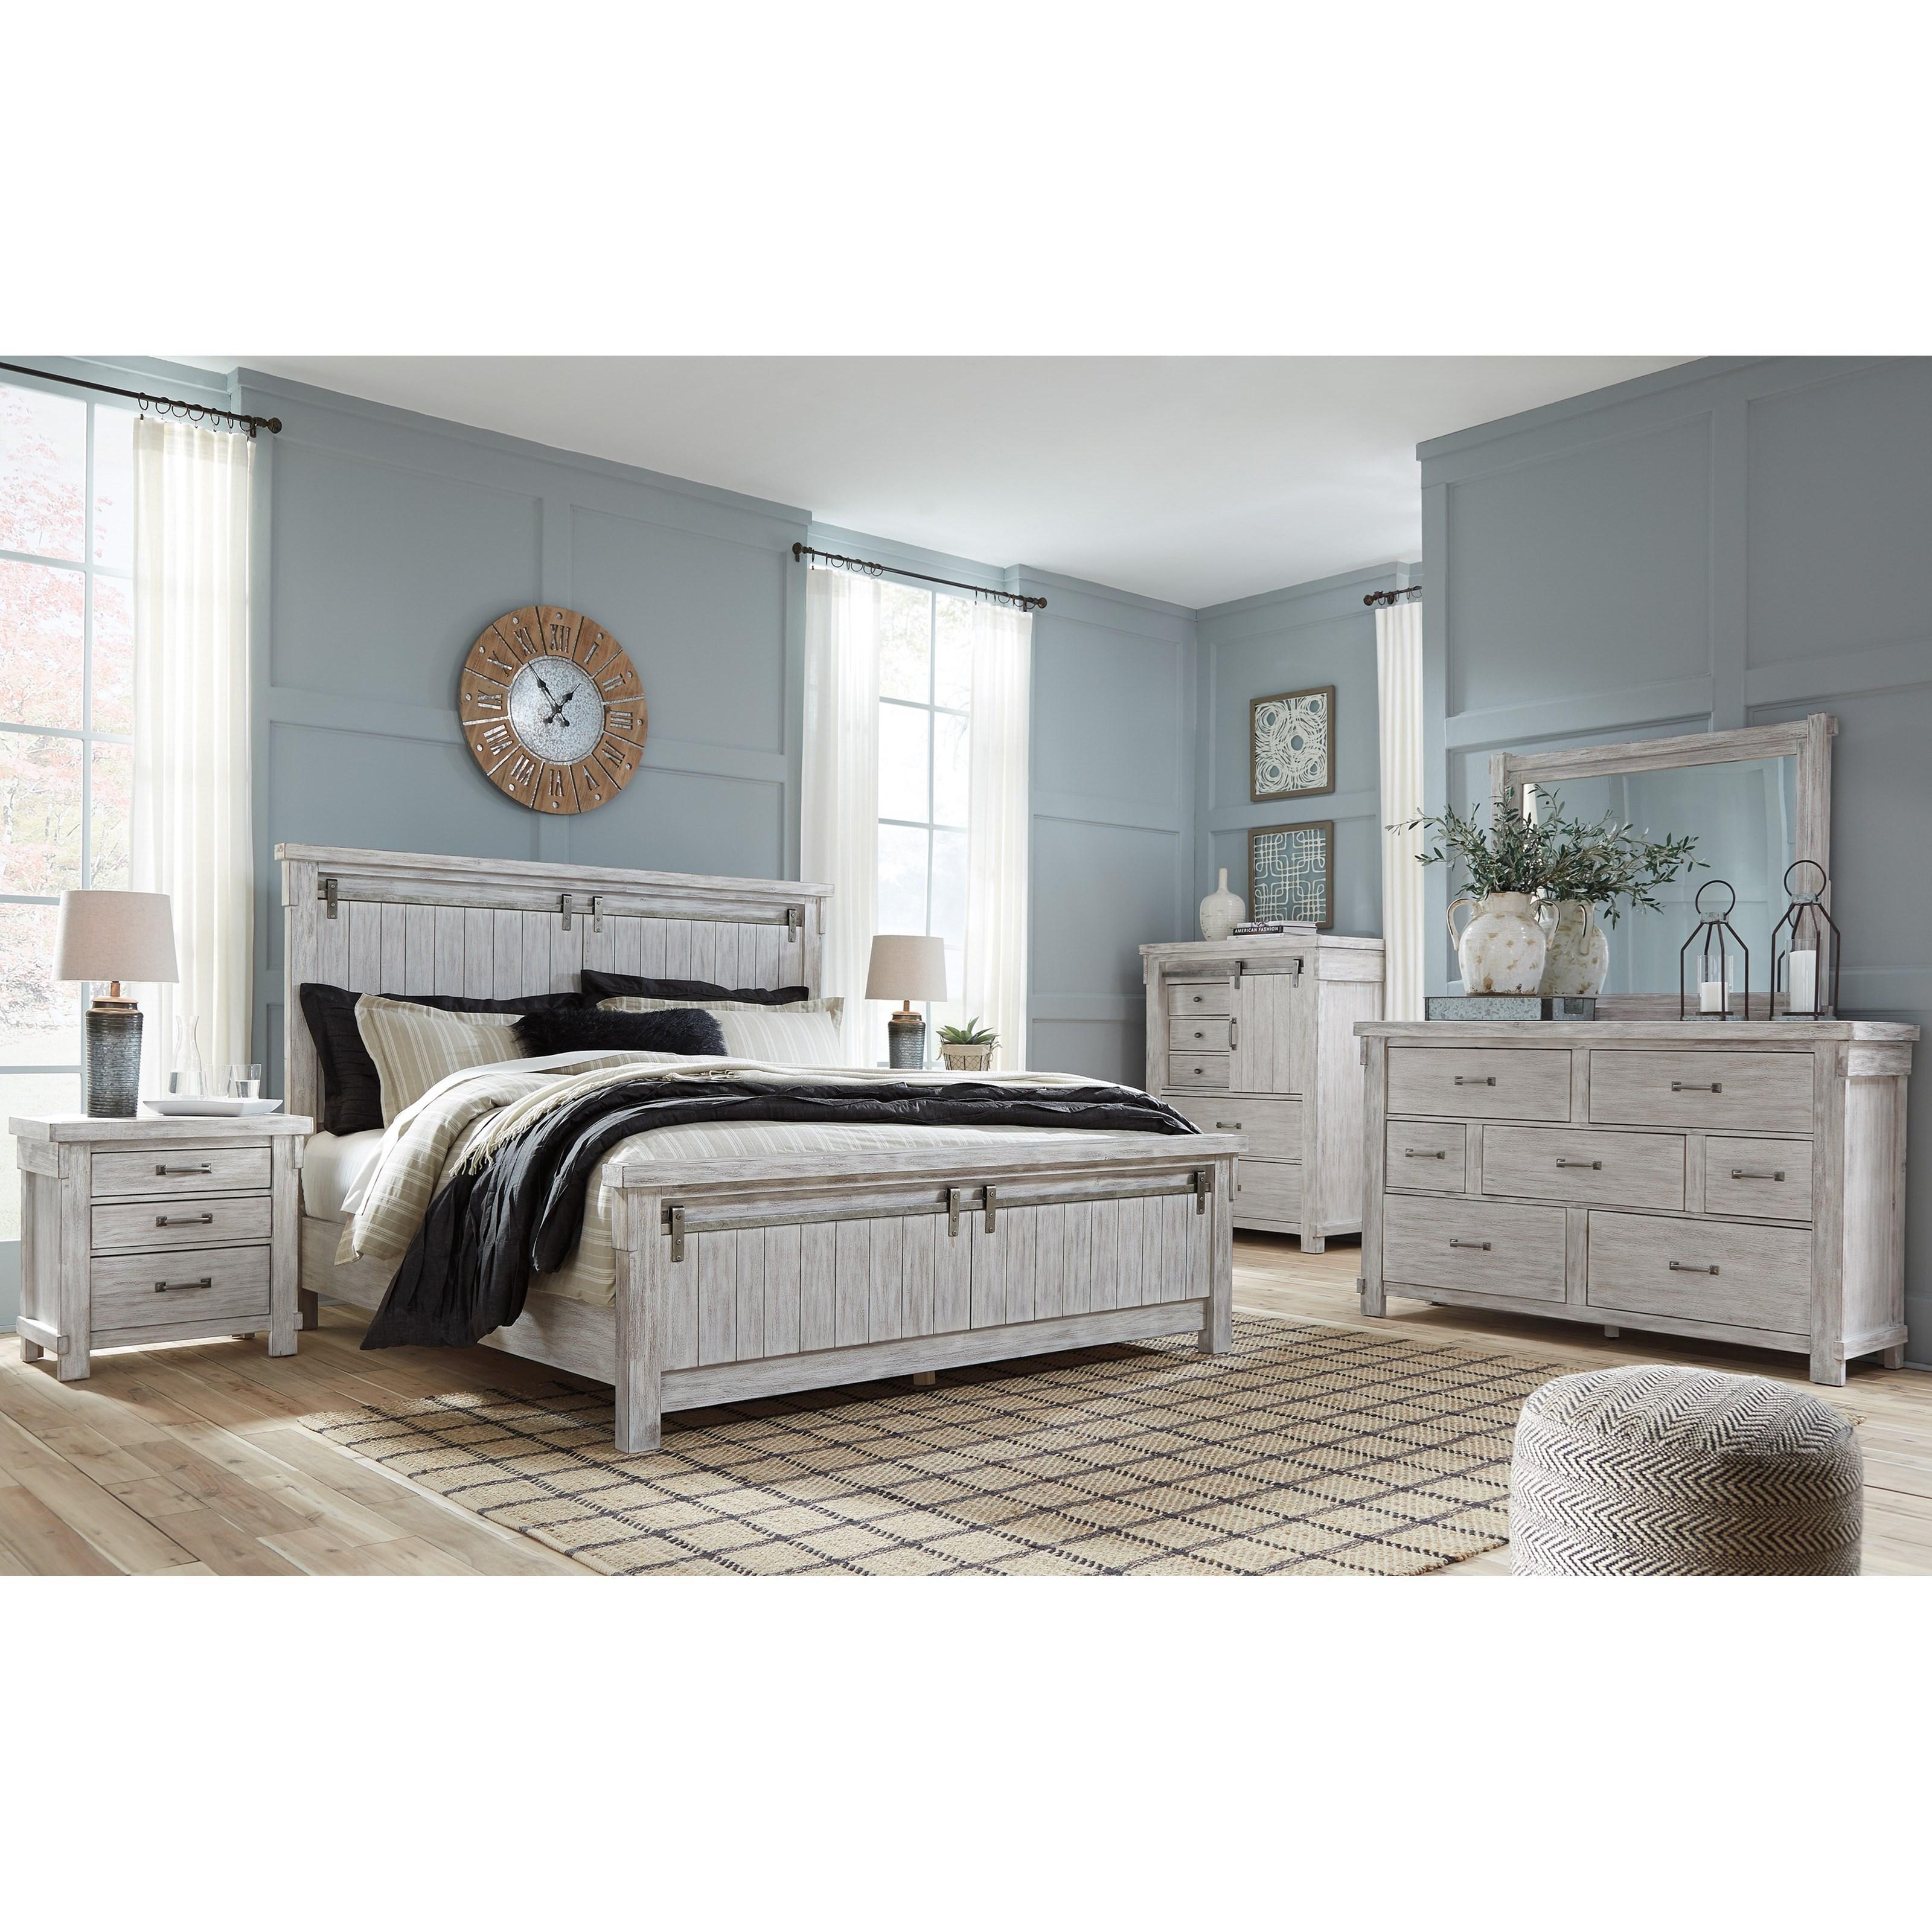 signature design by ashley brashland queen bedroom group becker furniture world bedroom groups On bedroom groups